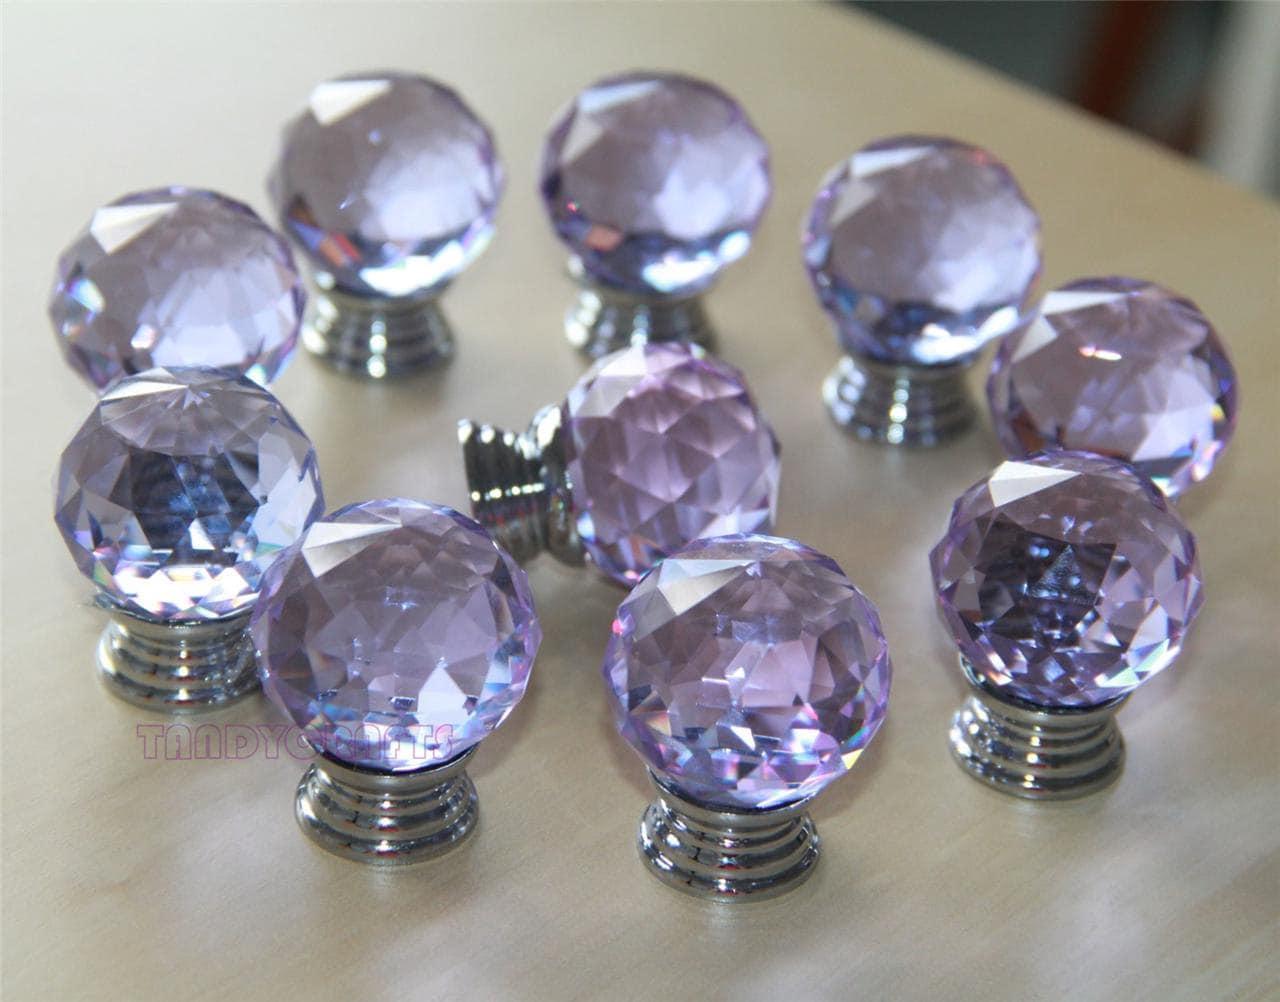 8 Pcs Purple Crystal Knobs Dresser Drawer Knobs Pulls